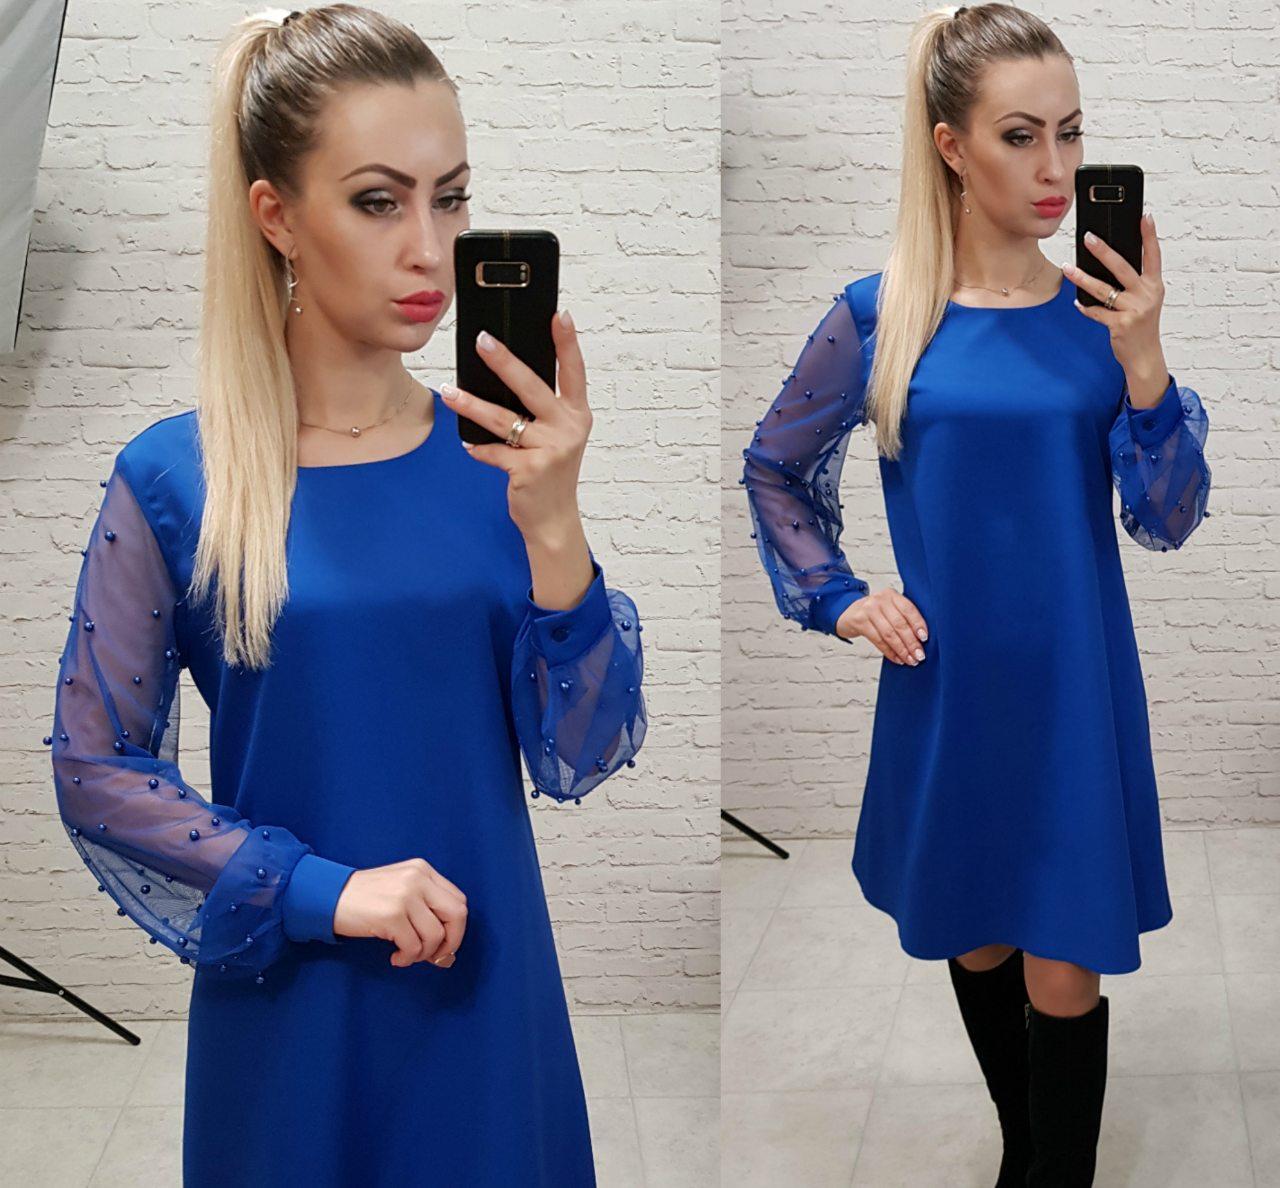 Платье женское, креп+сетка, модель 144, цвет - электрик